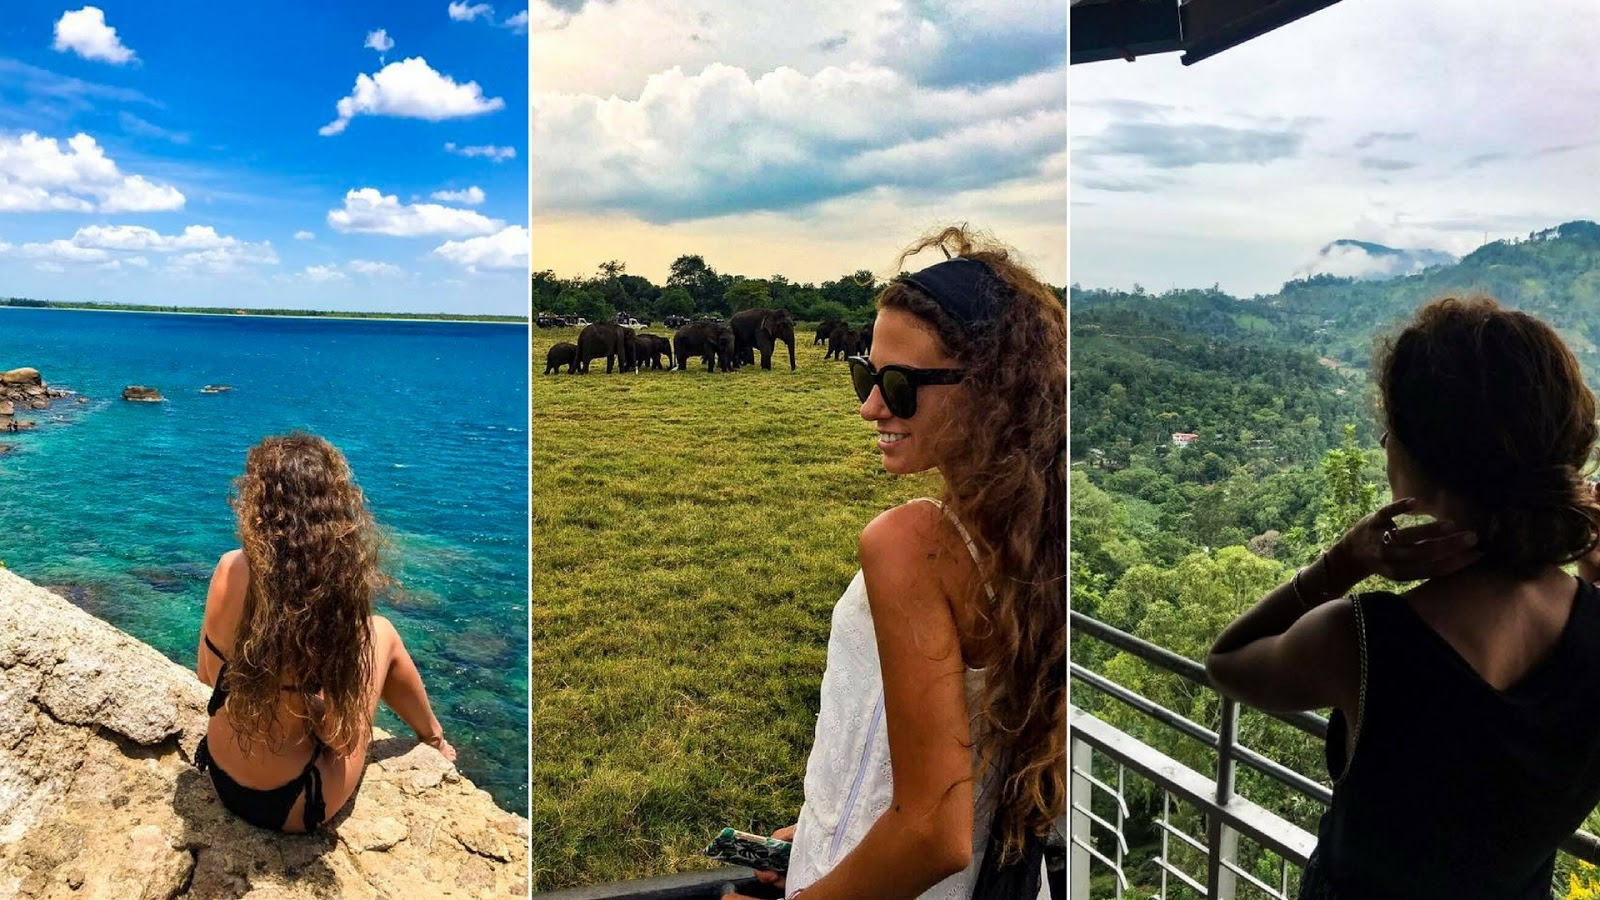 viaggio in Sri Lanka ad agosto 19 giorni e zaino in spalla, viaggio in Sri Lanka, organizzare viaggio in Sri Lanka, viaggio Sri Lanka, Sri Lanka agosto, Sri Lanka viaggi, viaggio Sri Lanka, Valentina Rago, fashion need, esala perahera, travel blog milano, travel blog Italia